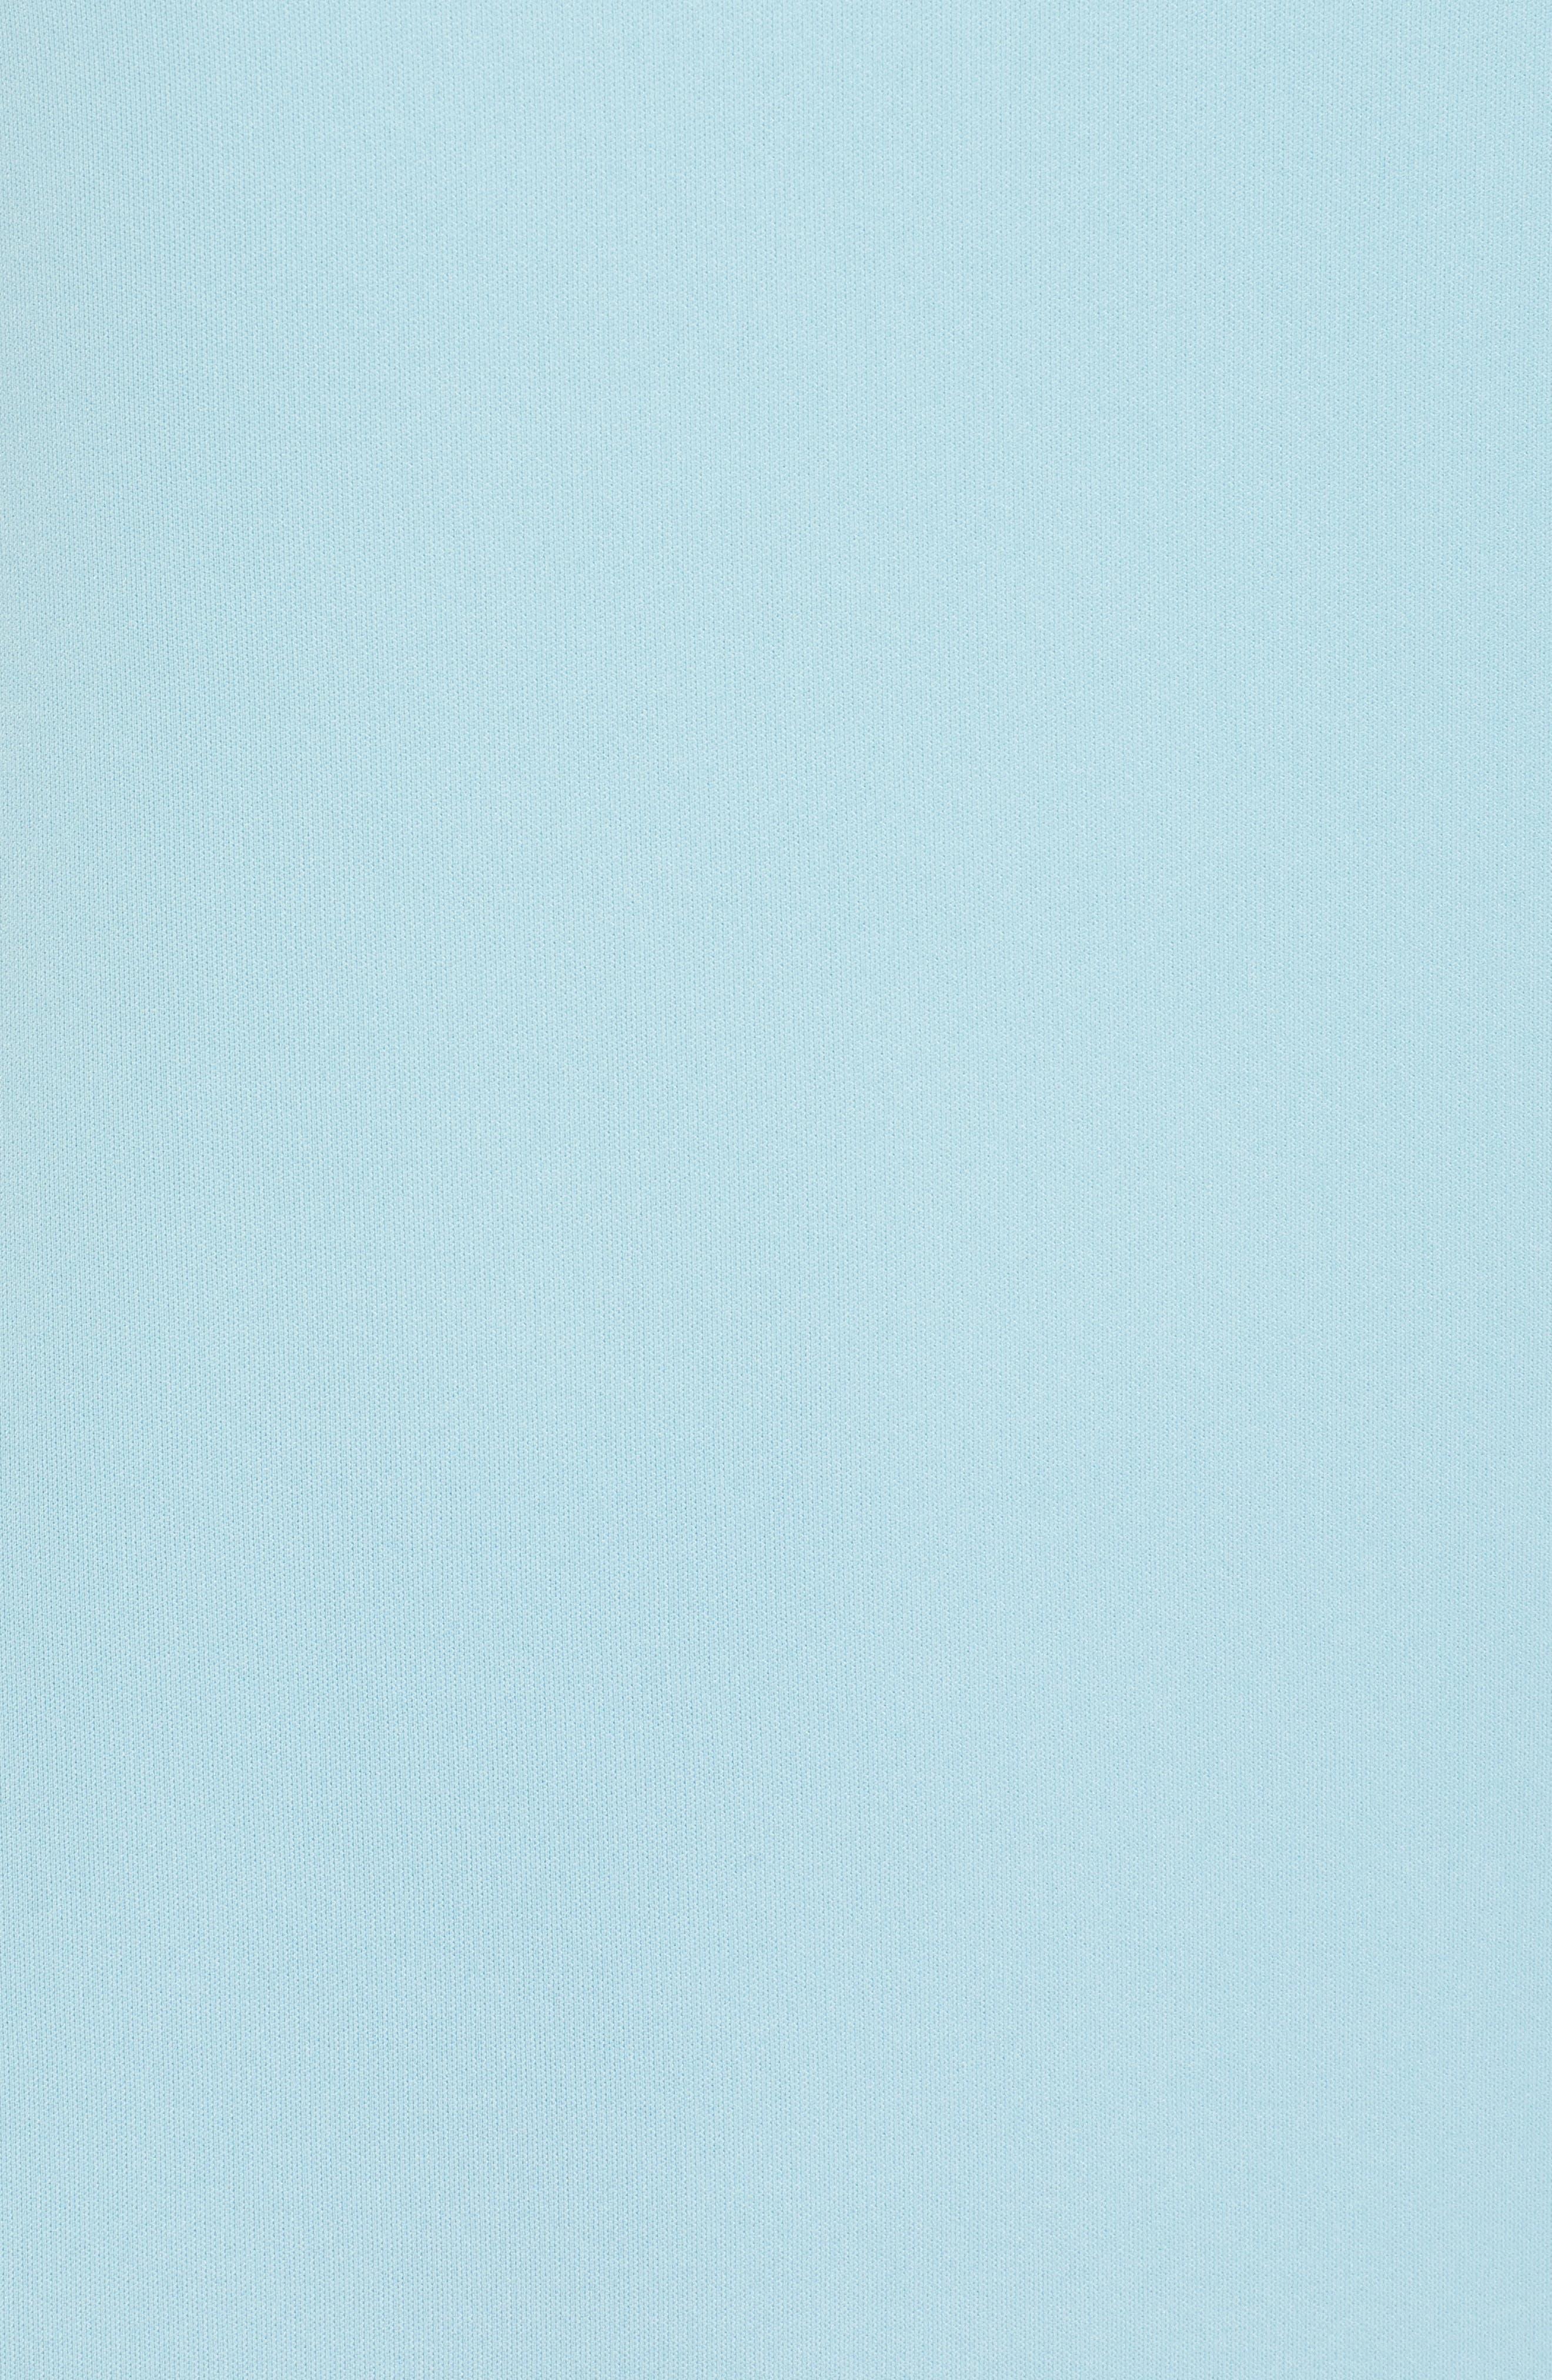 Ilyna Crepe Short Sleeve Top,                             Alternate thumbnail 6, color,                             LAGOON BLUE